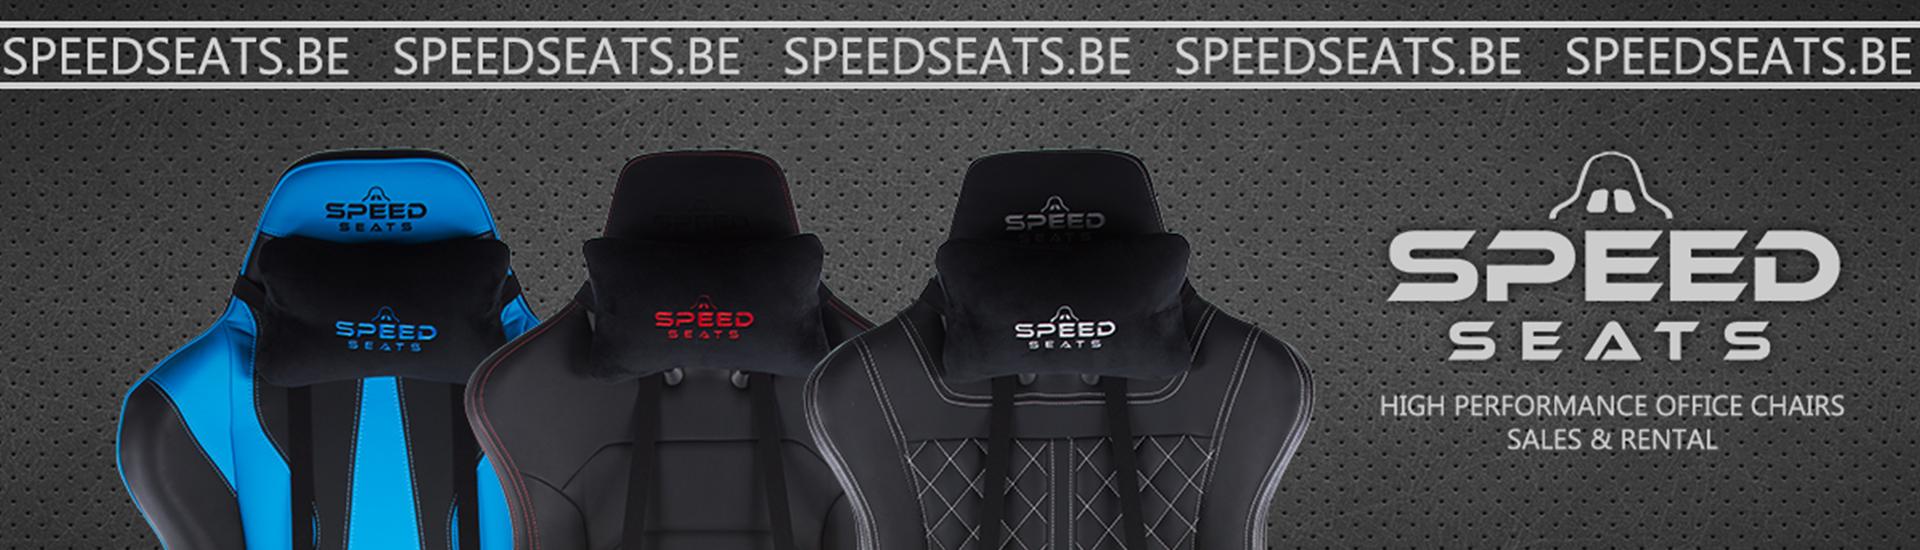 Speedseats